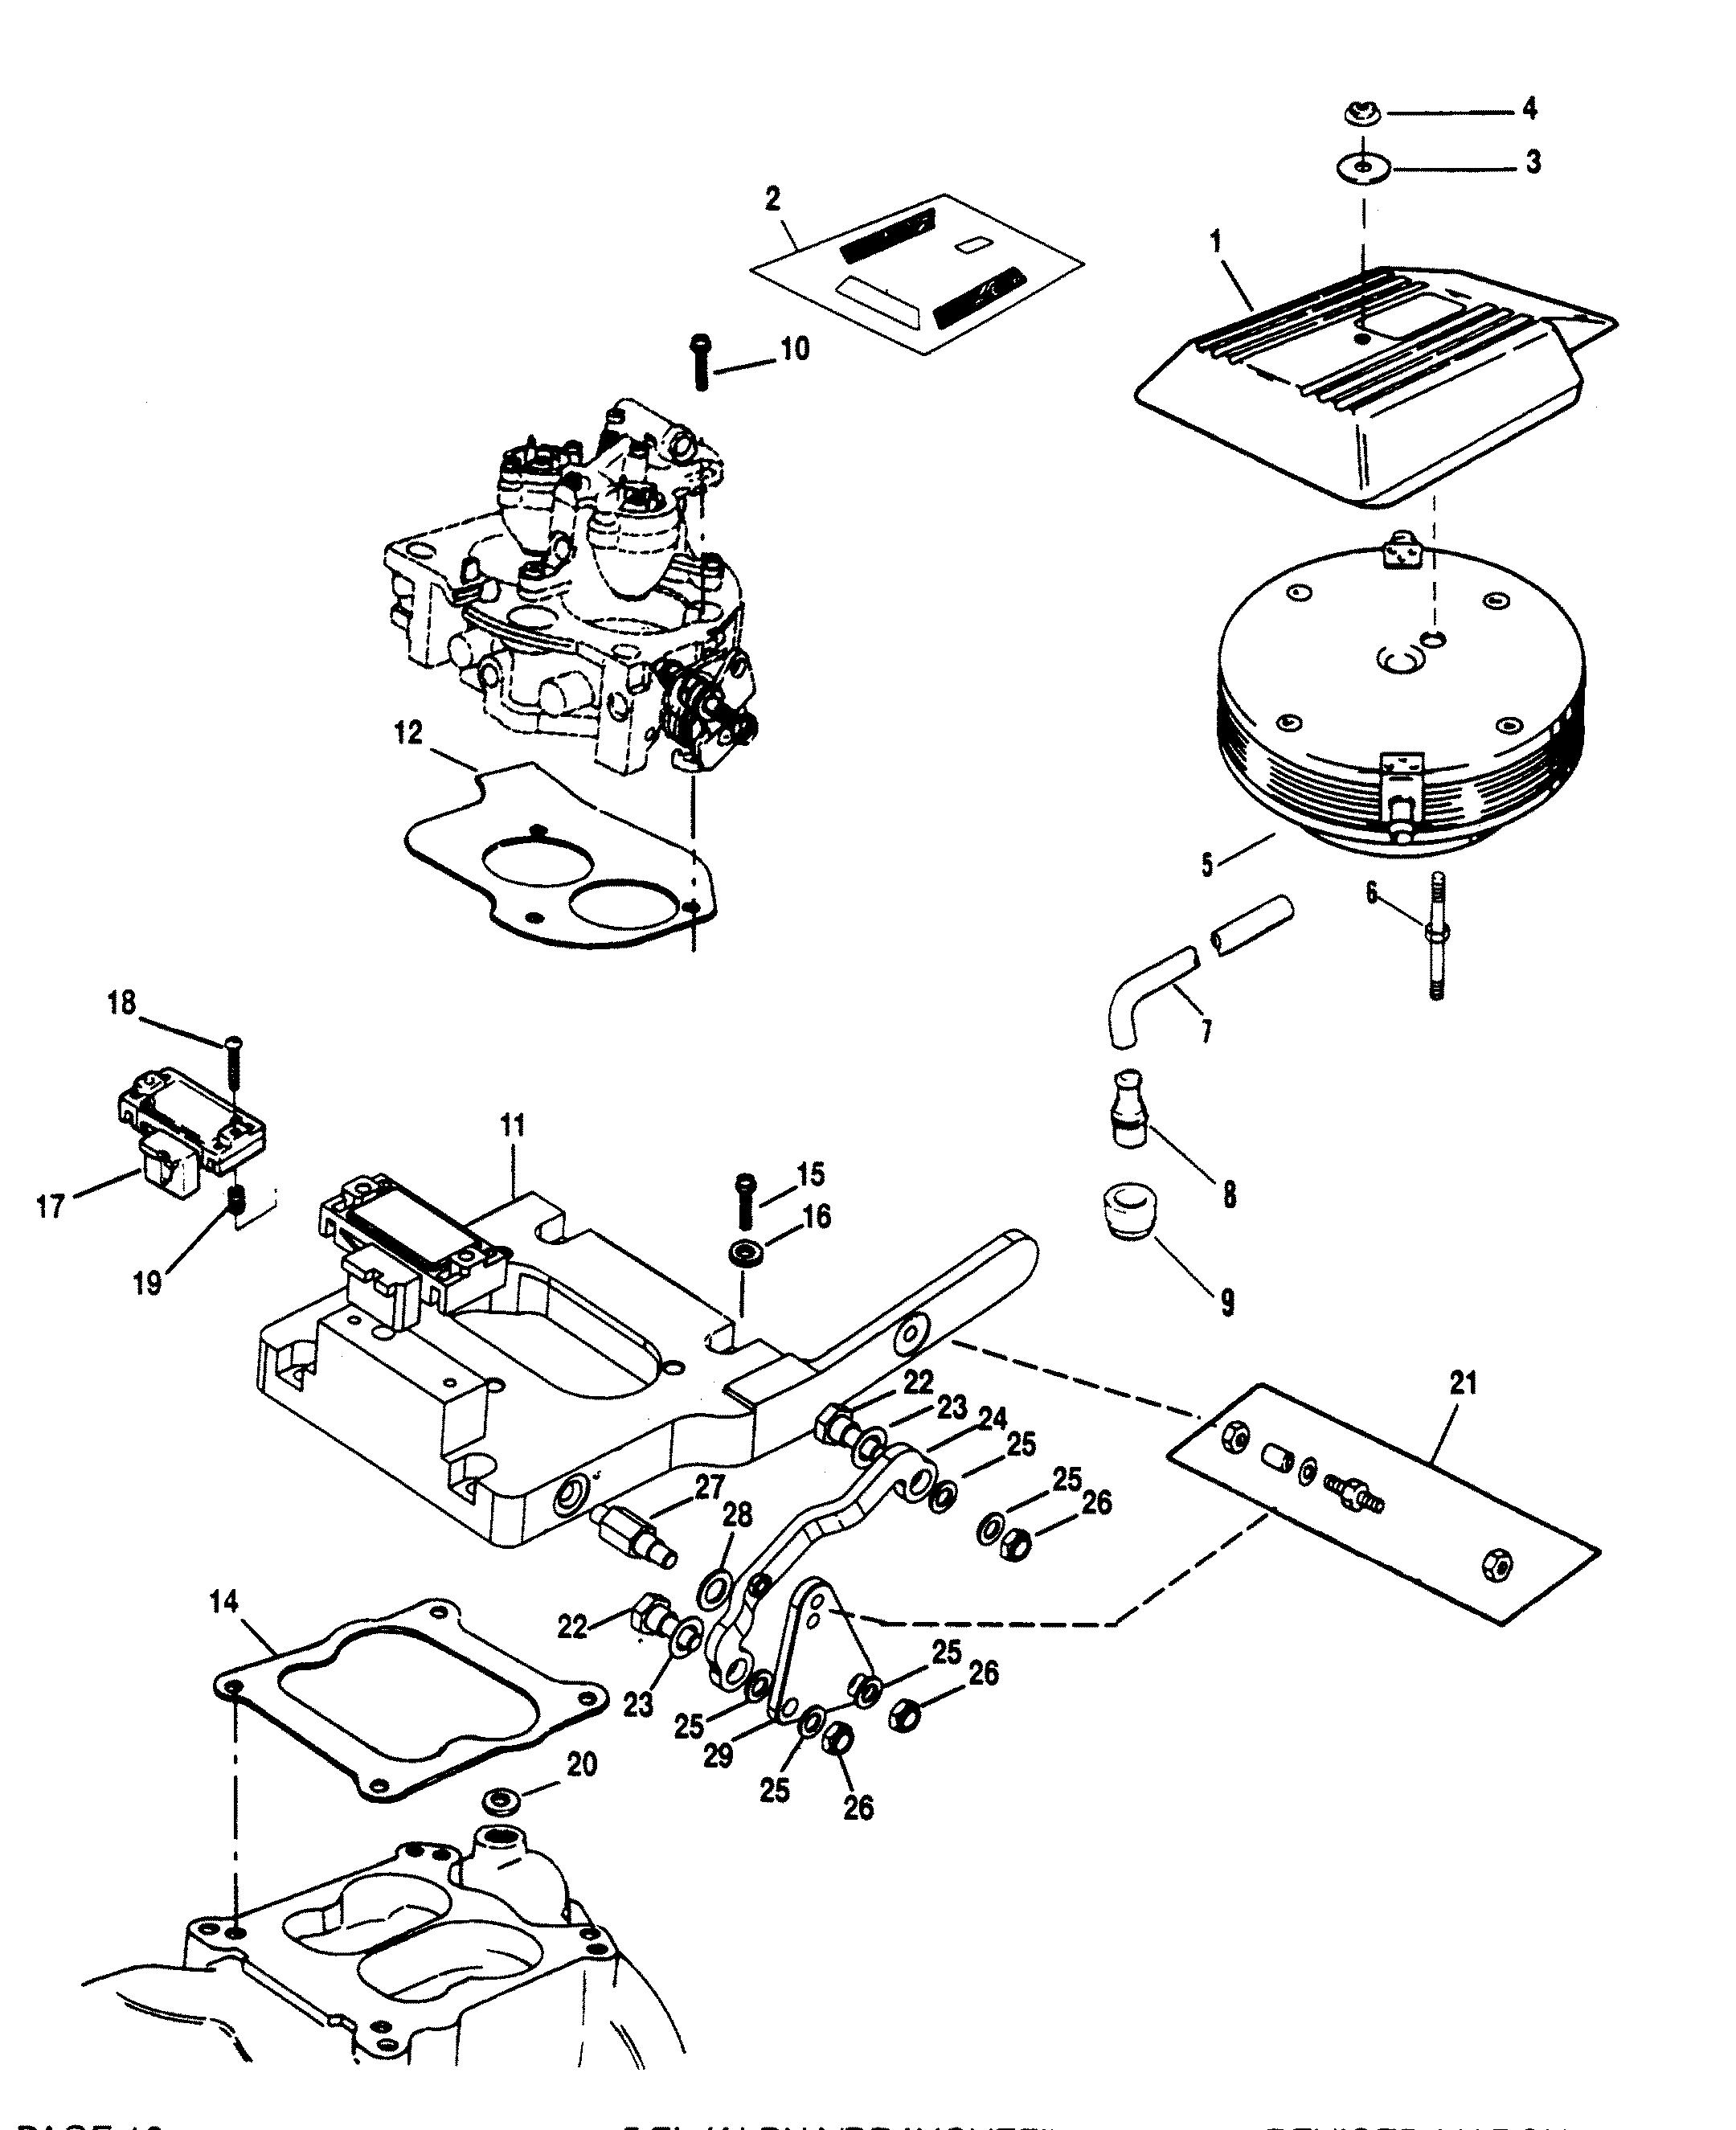 throttle linkage for mercruiser 5 7l alpha efi tbi 5 7l bravo efi tbi engine